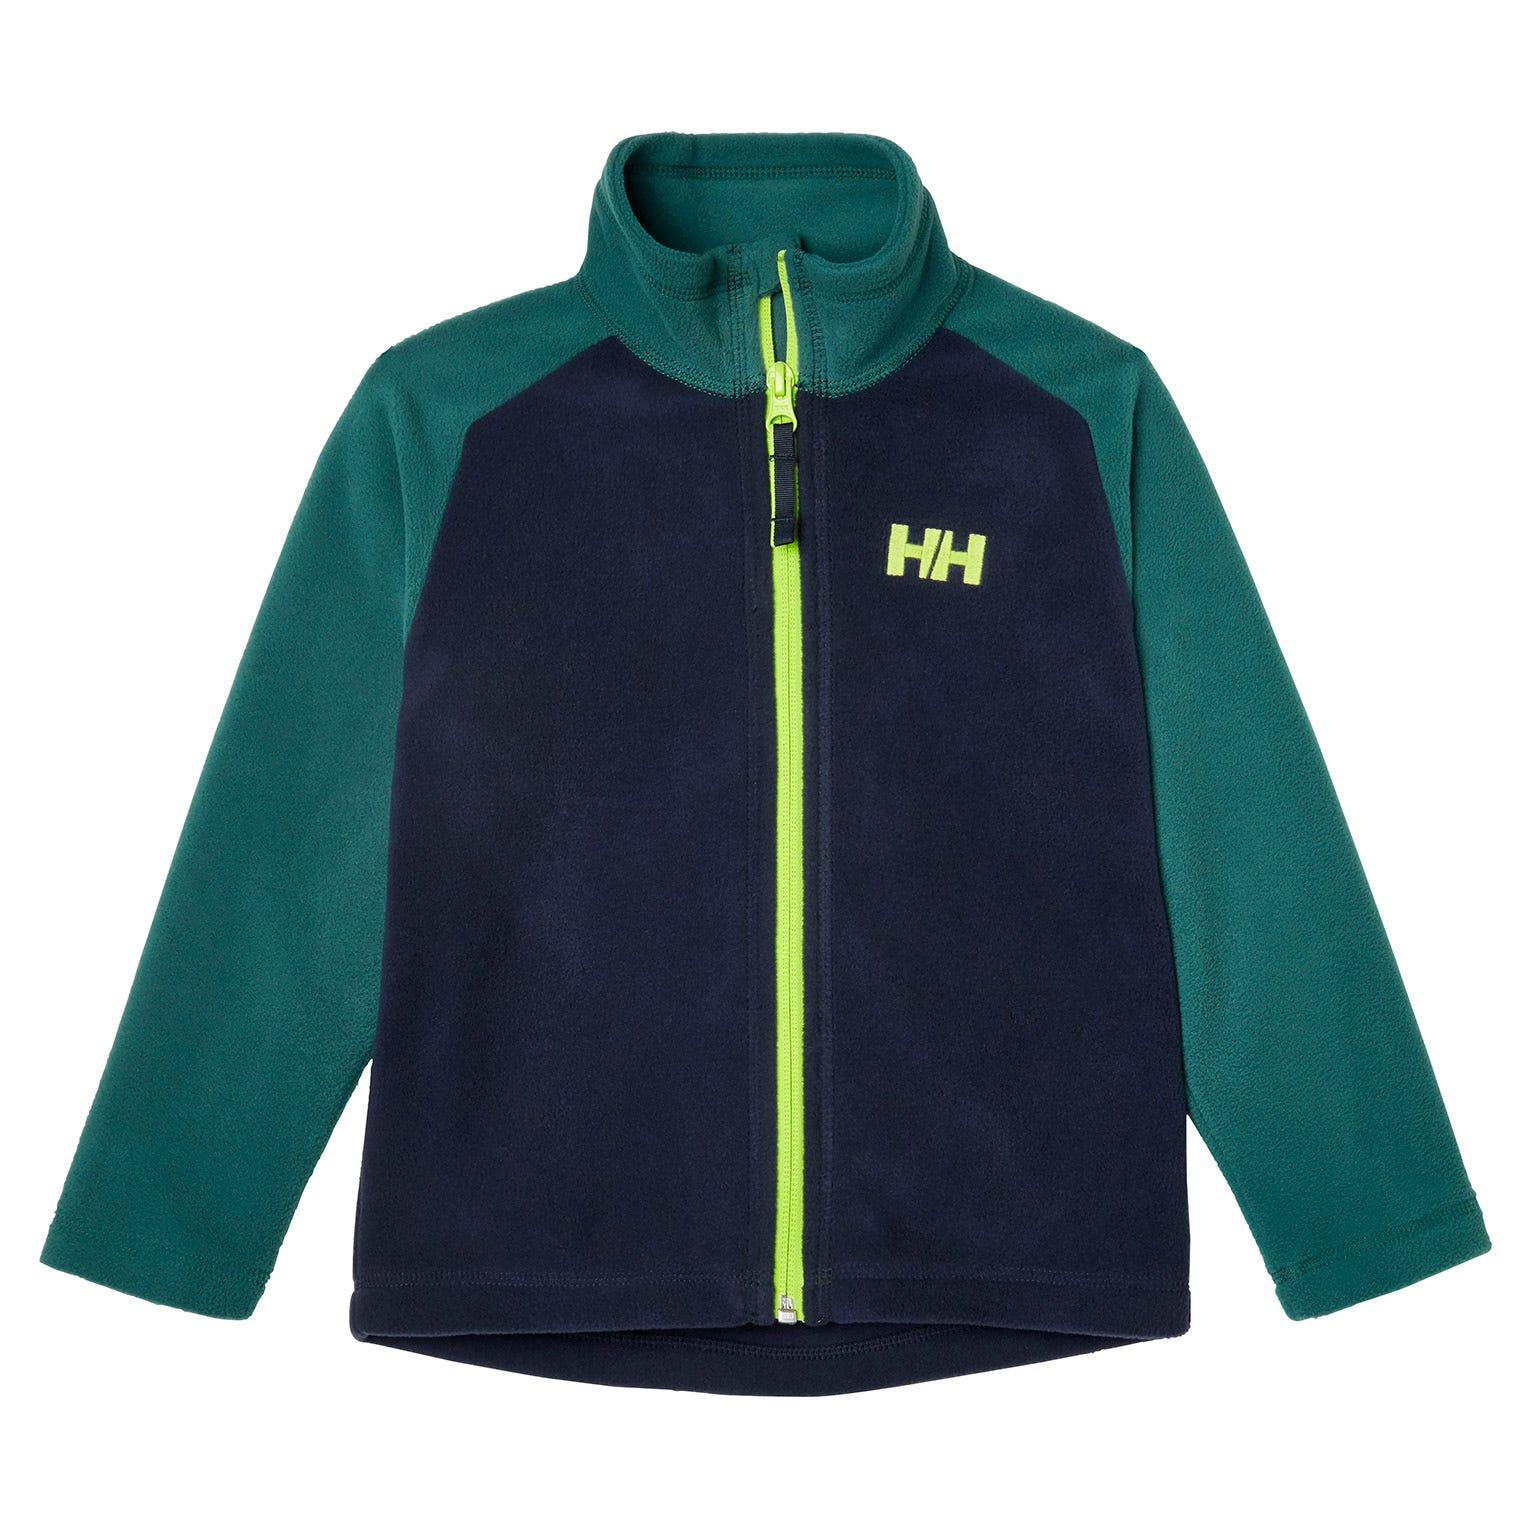 Helly Hansen Kids Daybreaker 2.0 Jacket Fleece Navy 134/9